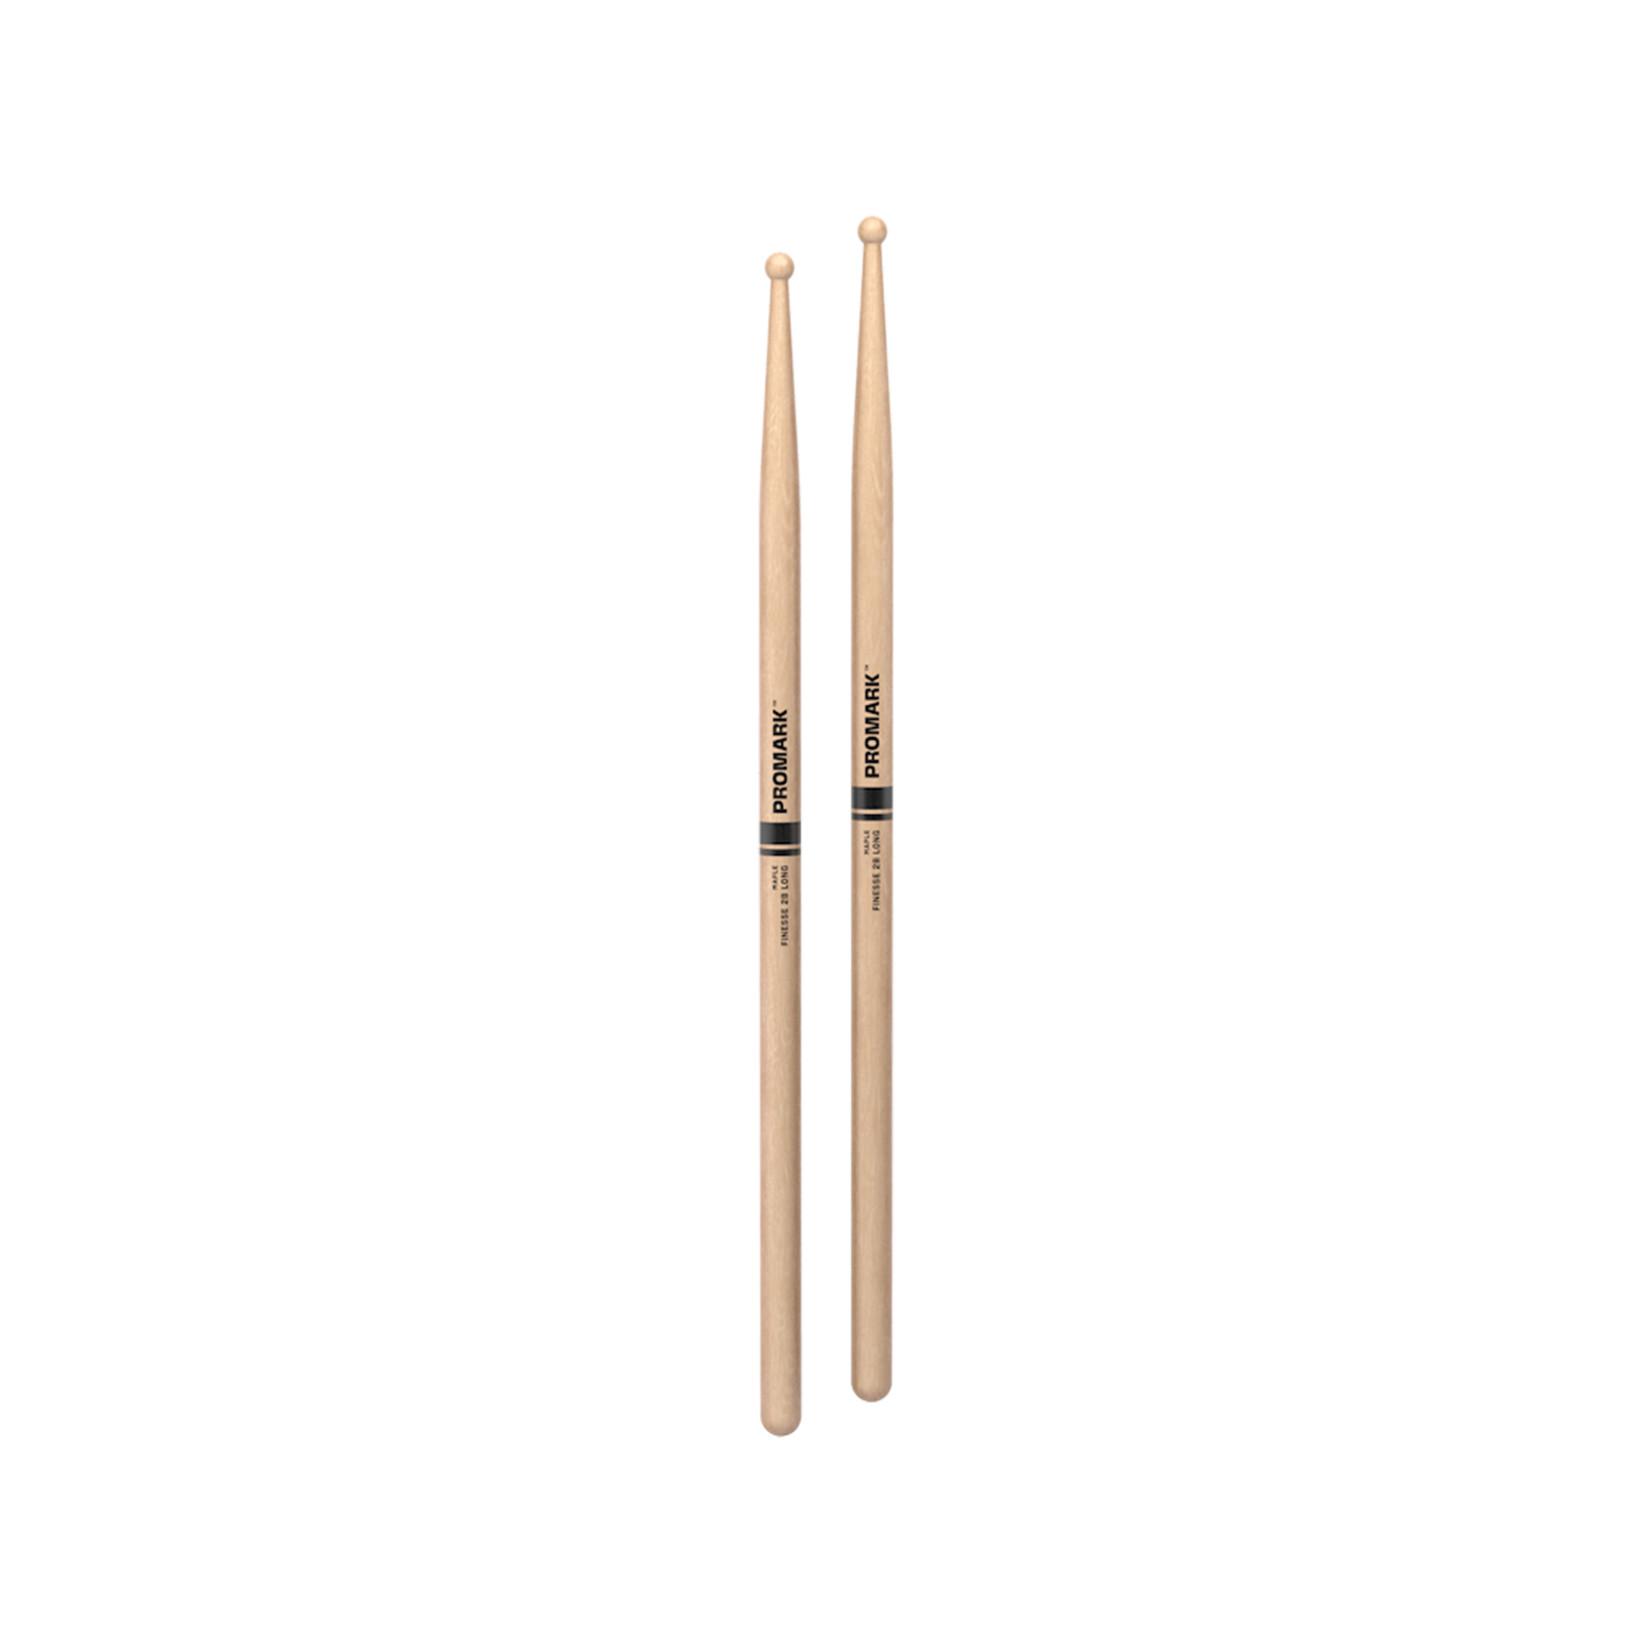 Promark ProMark Finesse 2B Maple Round Tip Drumstick